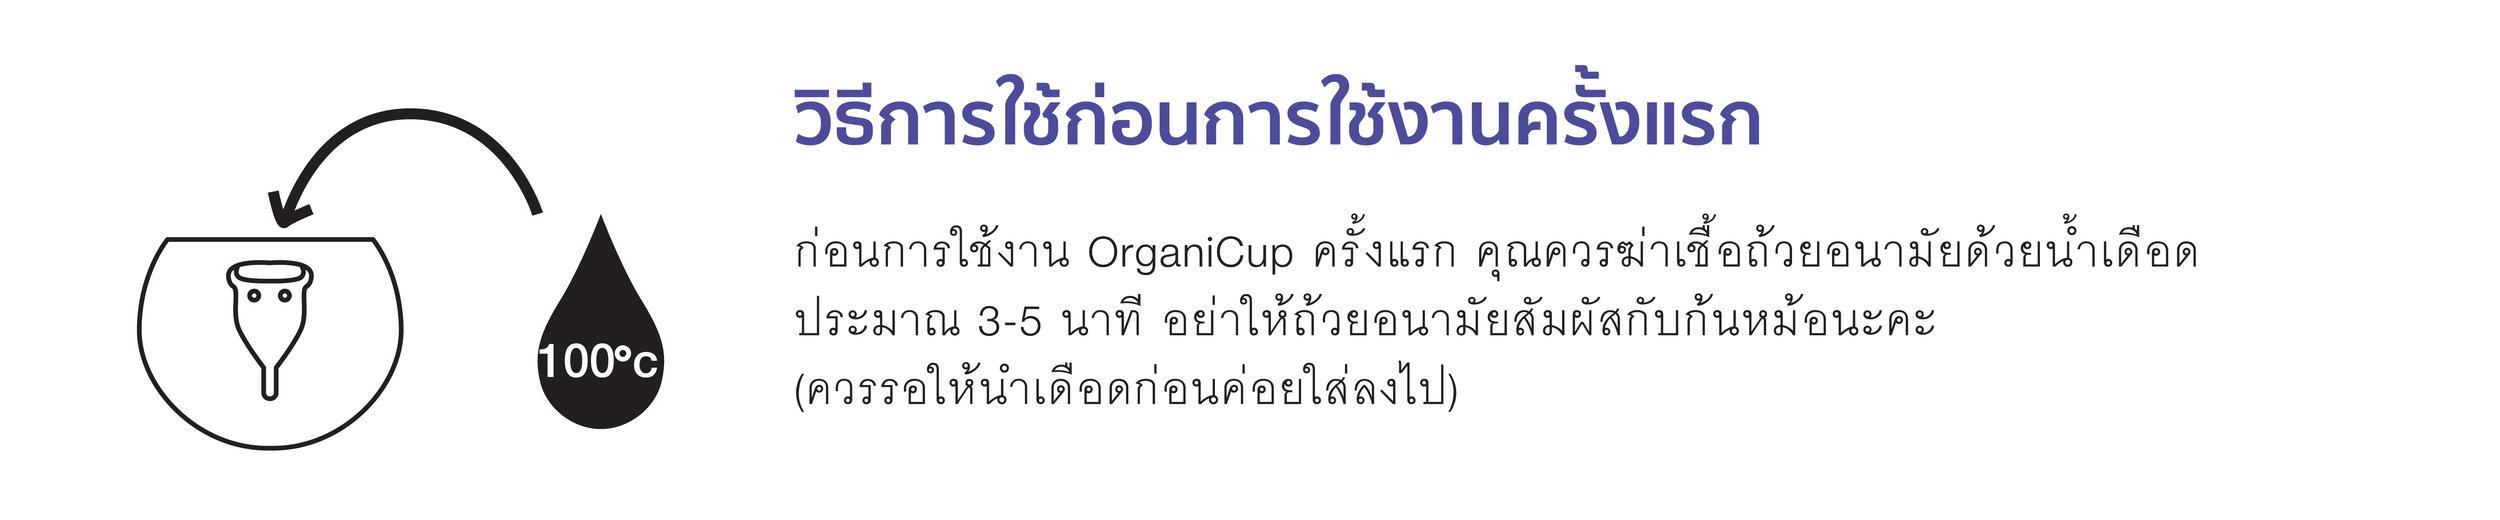 Organicup line AWCO-02.jpg